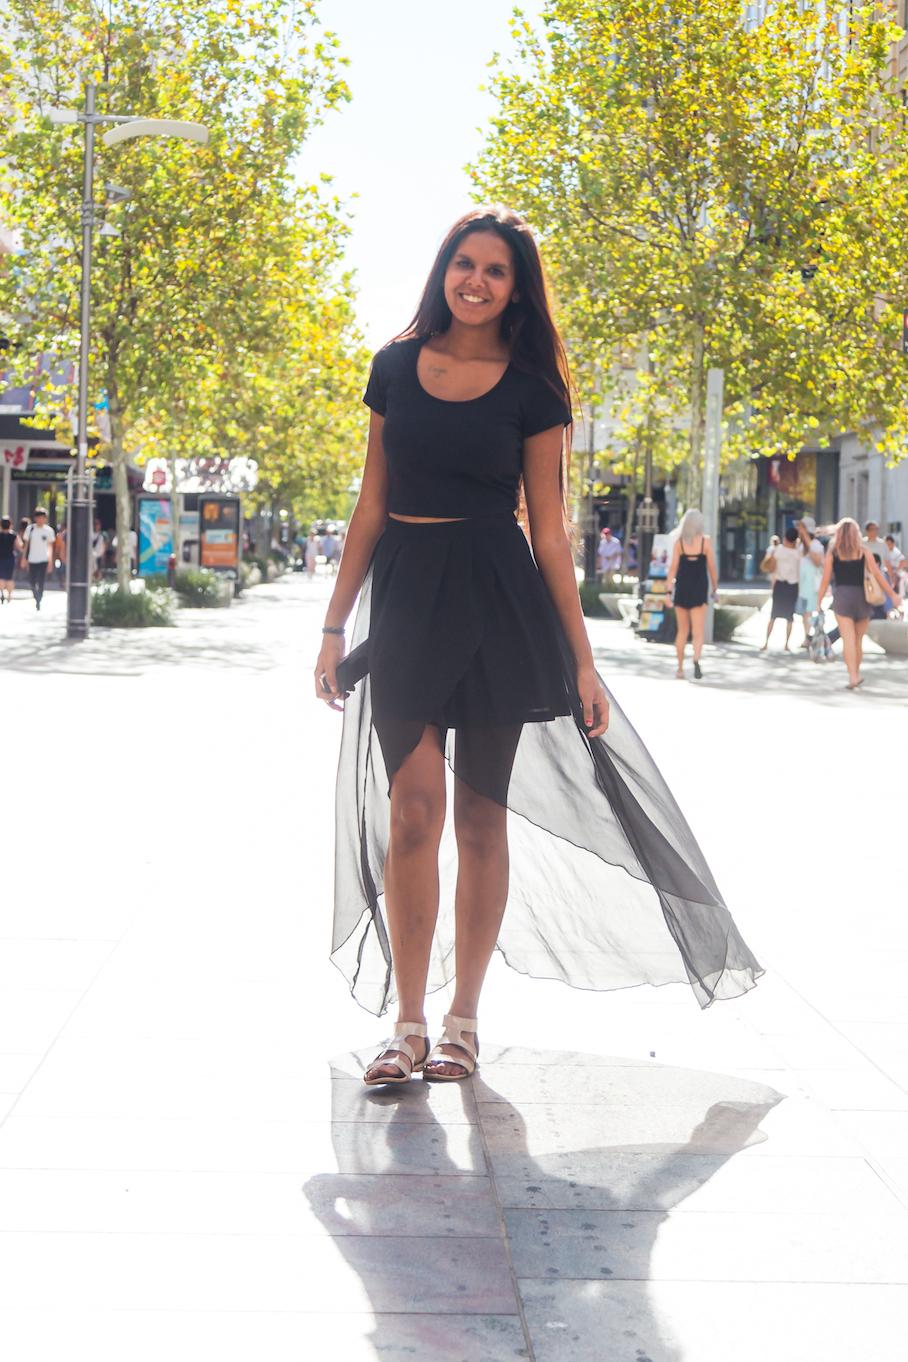 "WA: Cheryl Coyne, Perth City, spotted by <a href=""http://www.rahstudios.com.au/street-style.html/"" target=""_blank"">Alain Quah</a>"